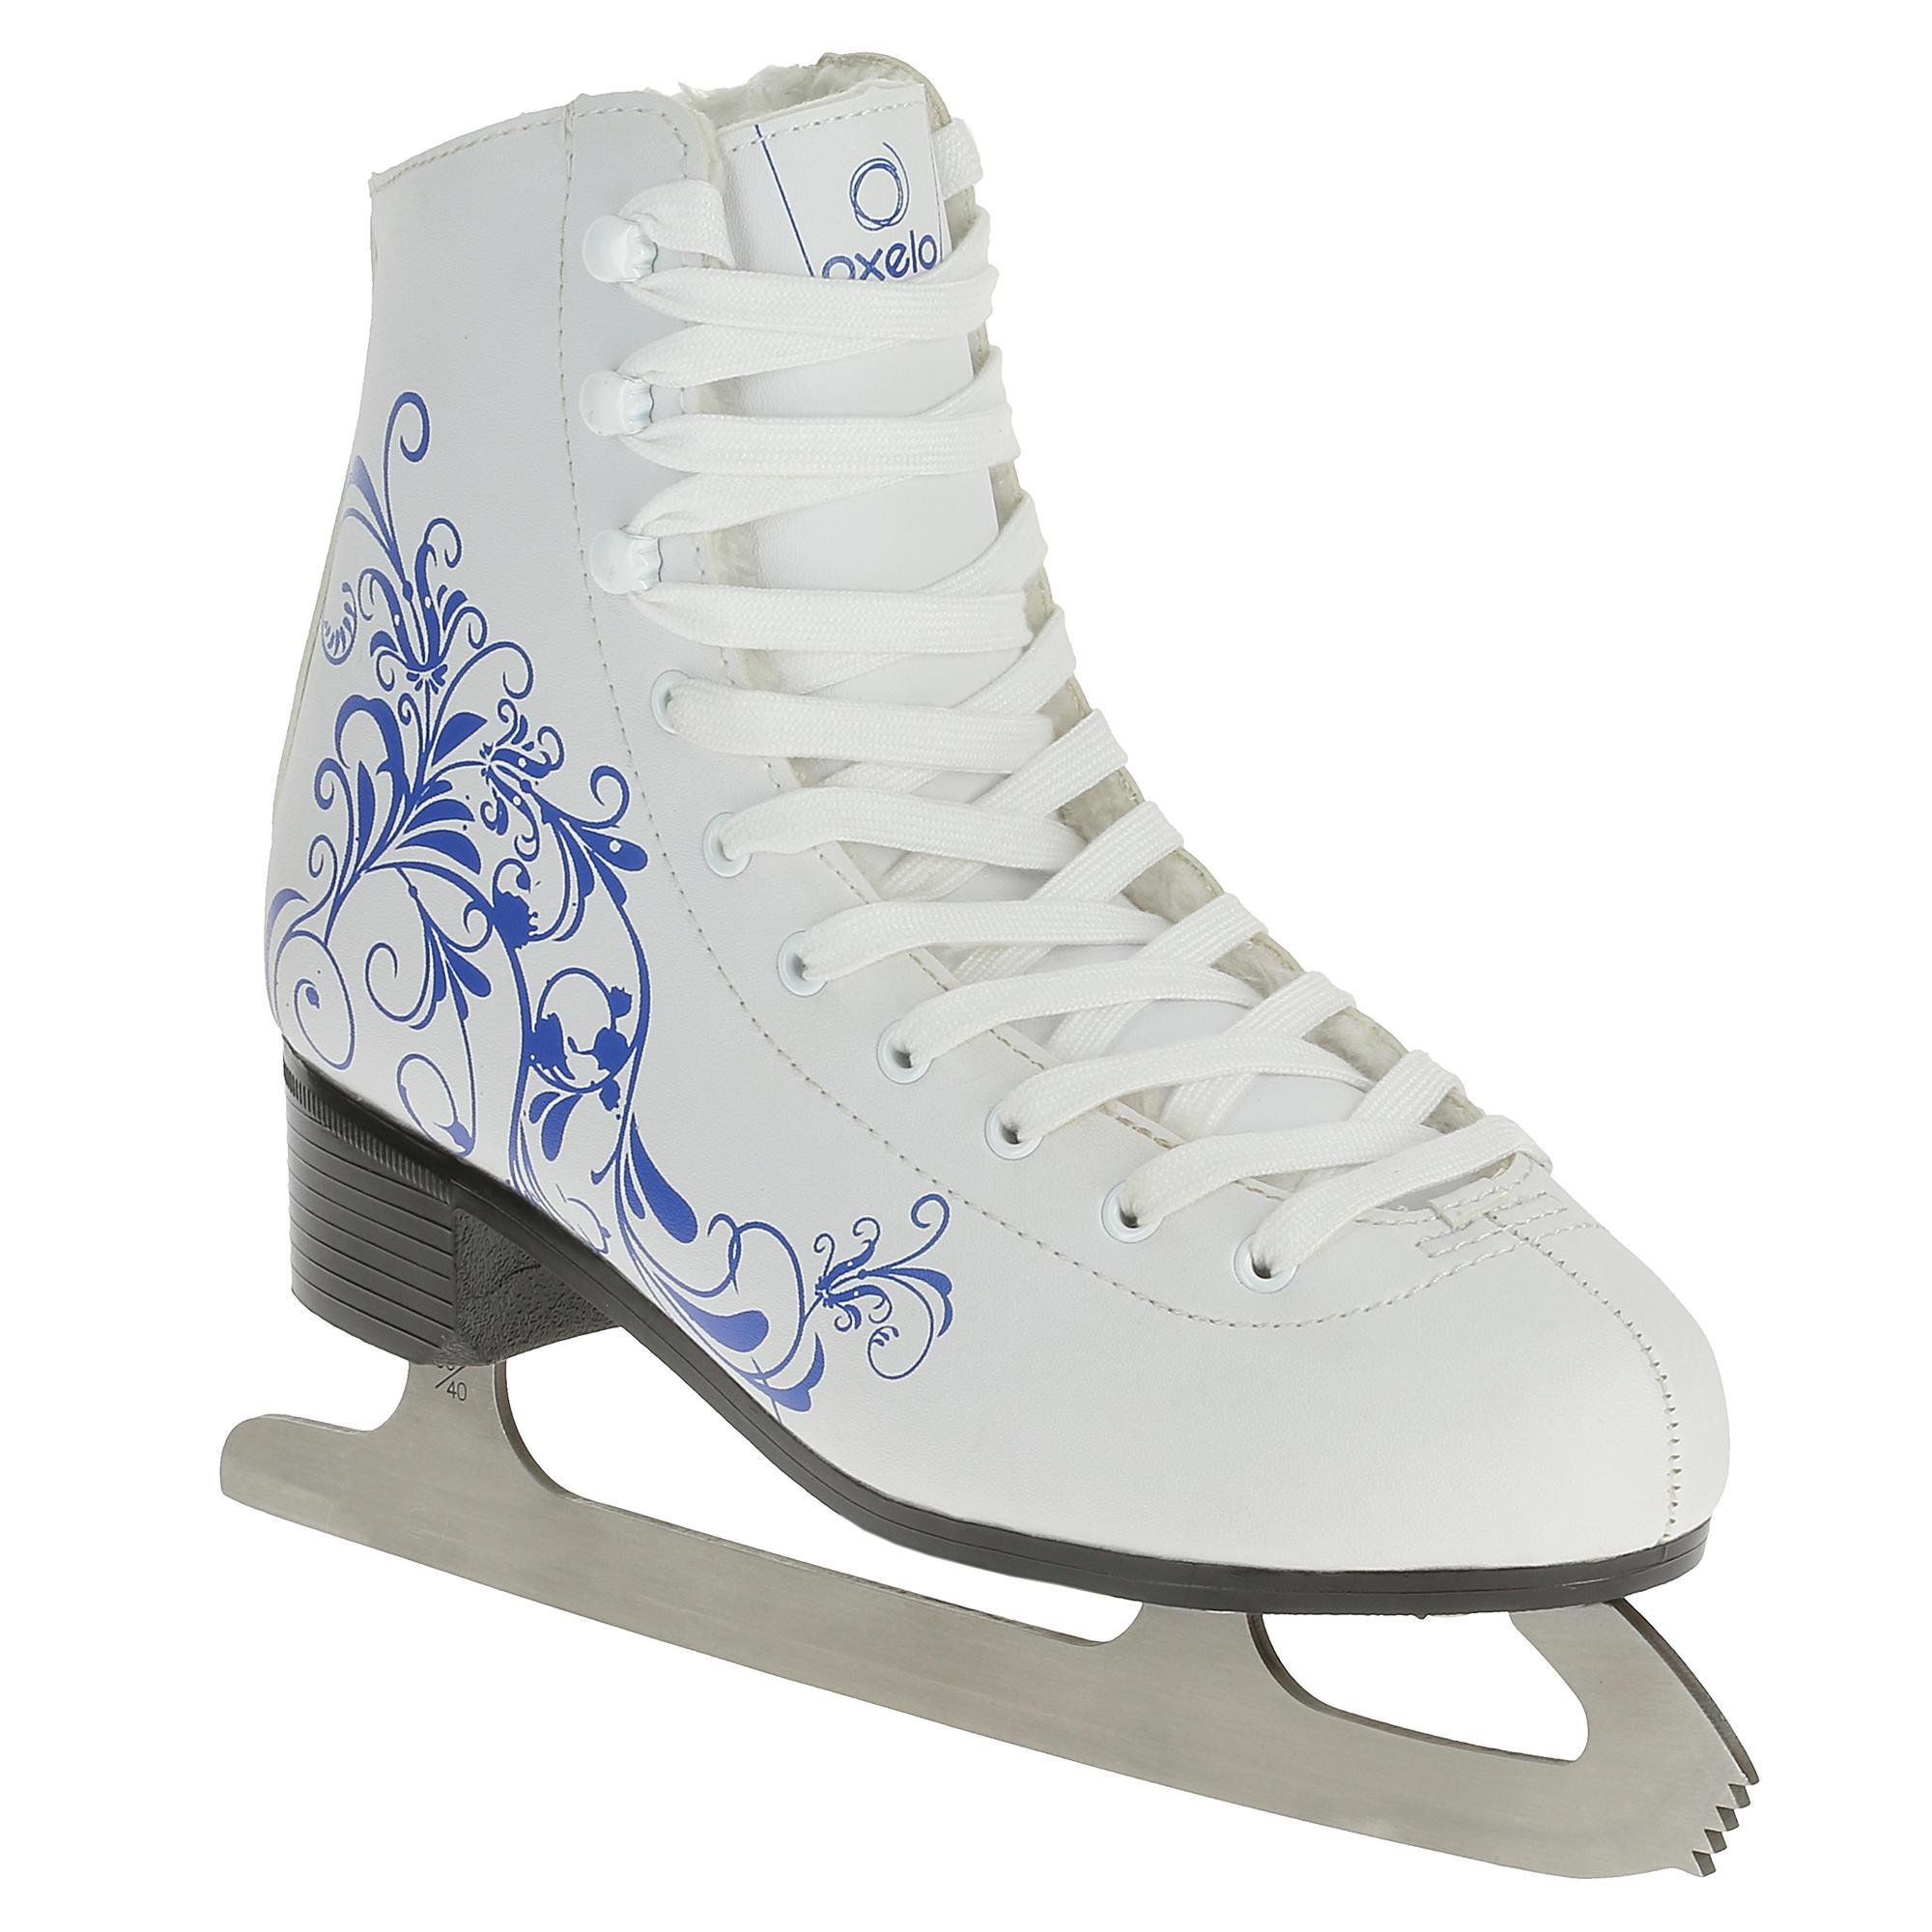 Artistic 1 Women's Warm Ice Skates